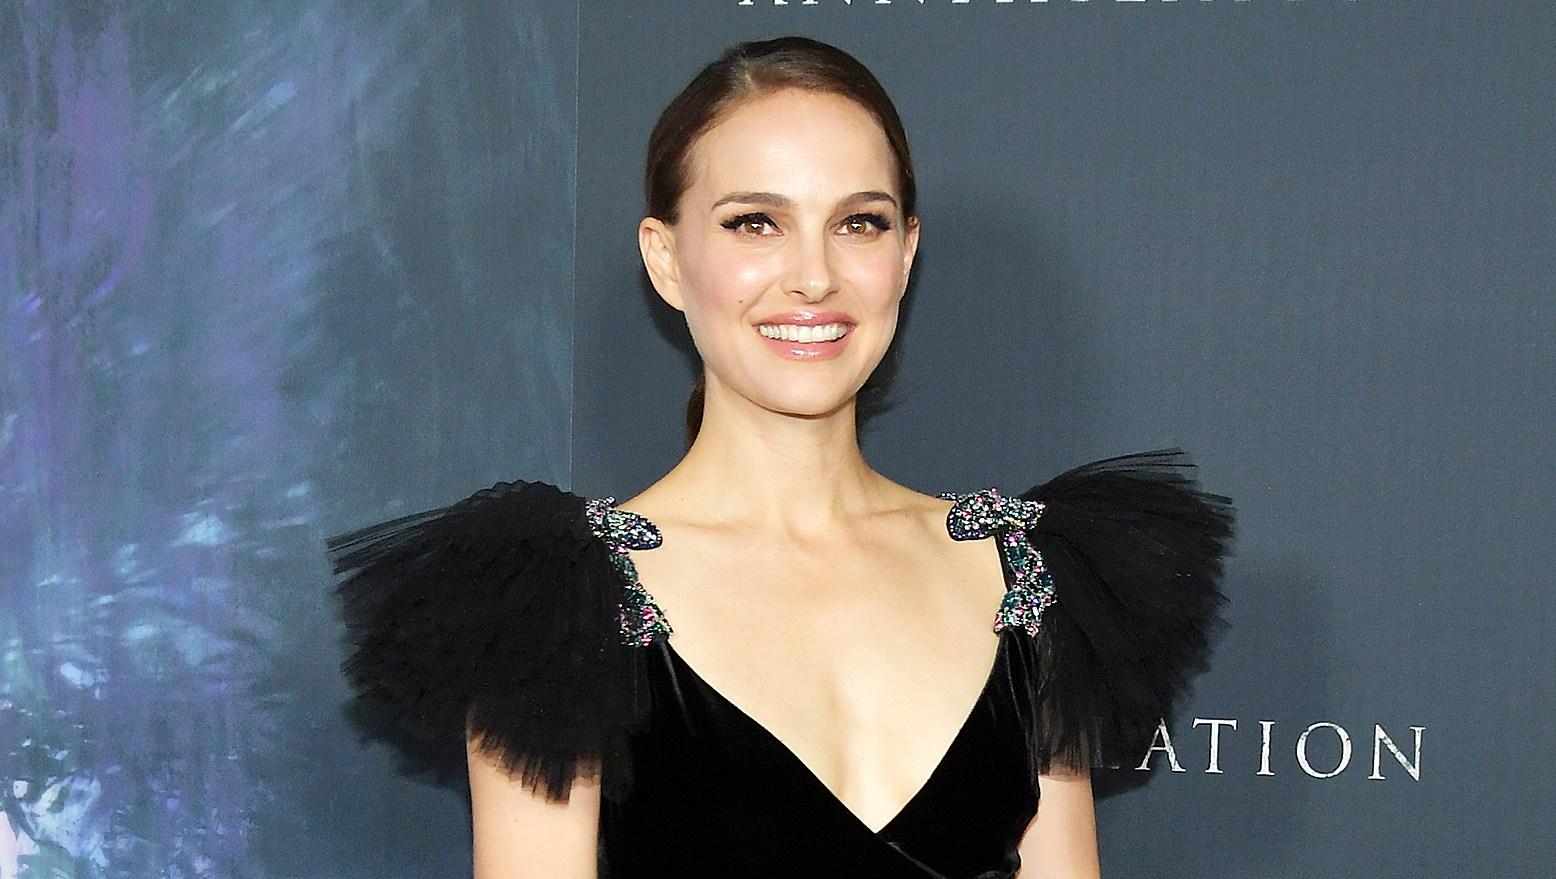 Natalie Portman Regrets Signing Roman Polanski Petition